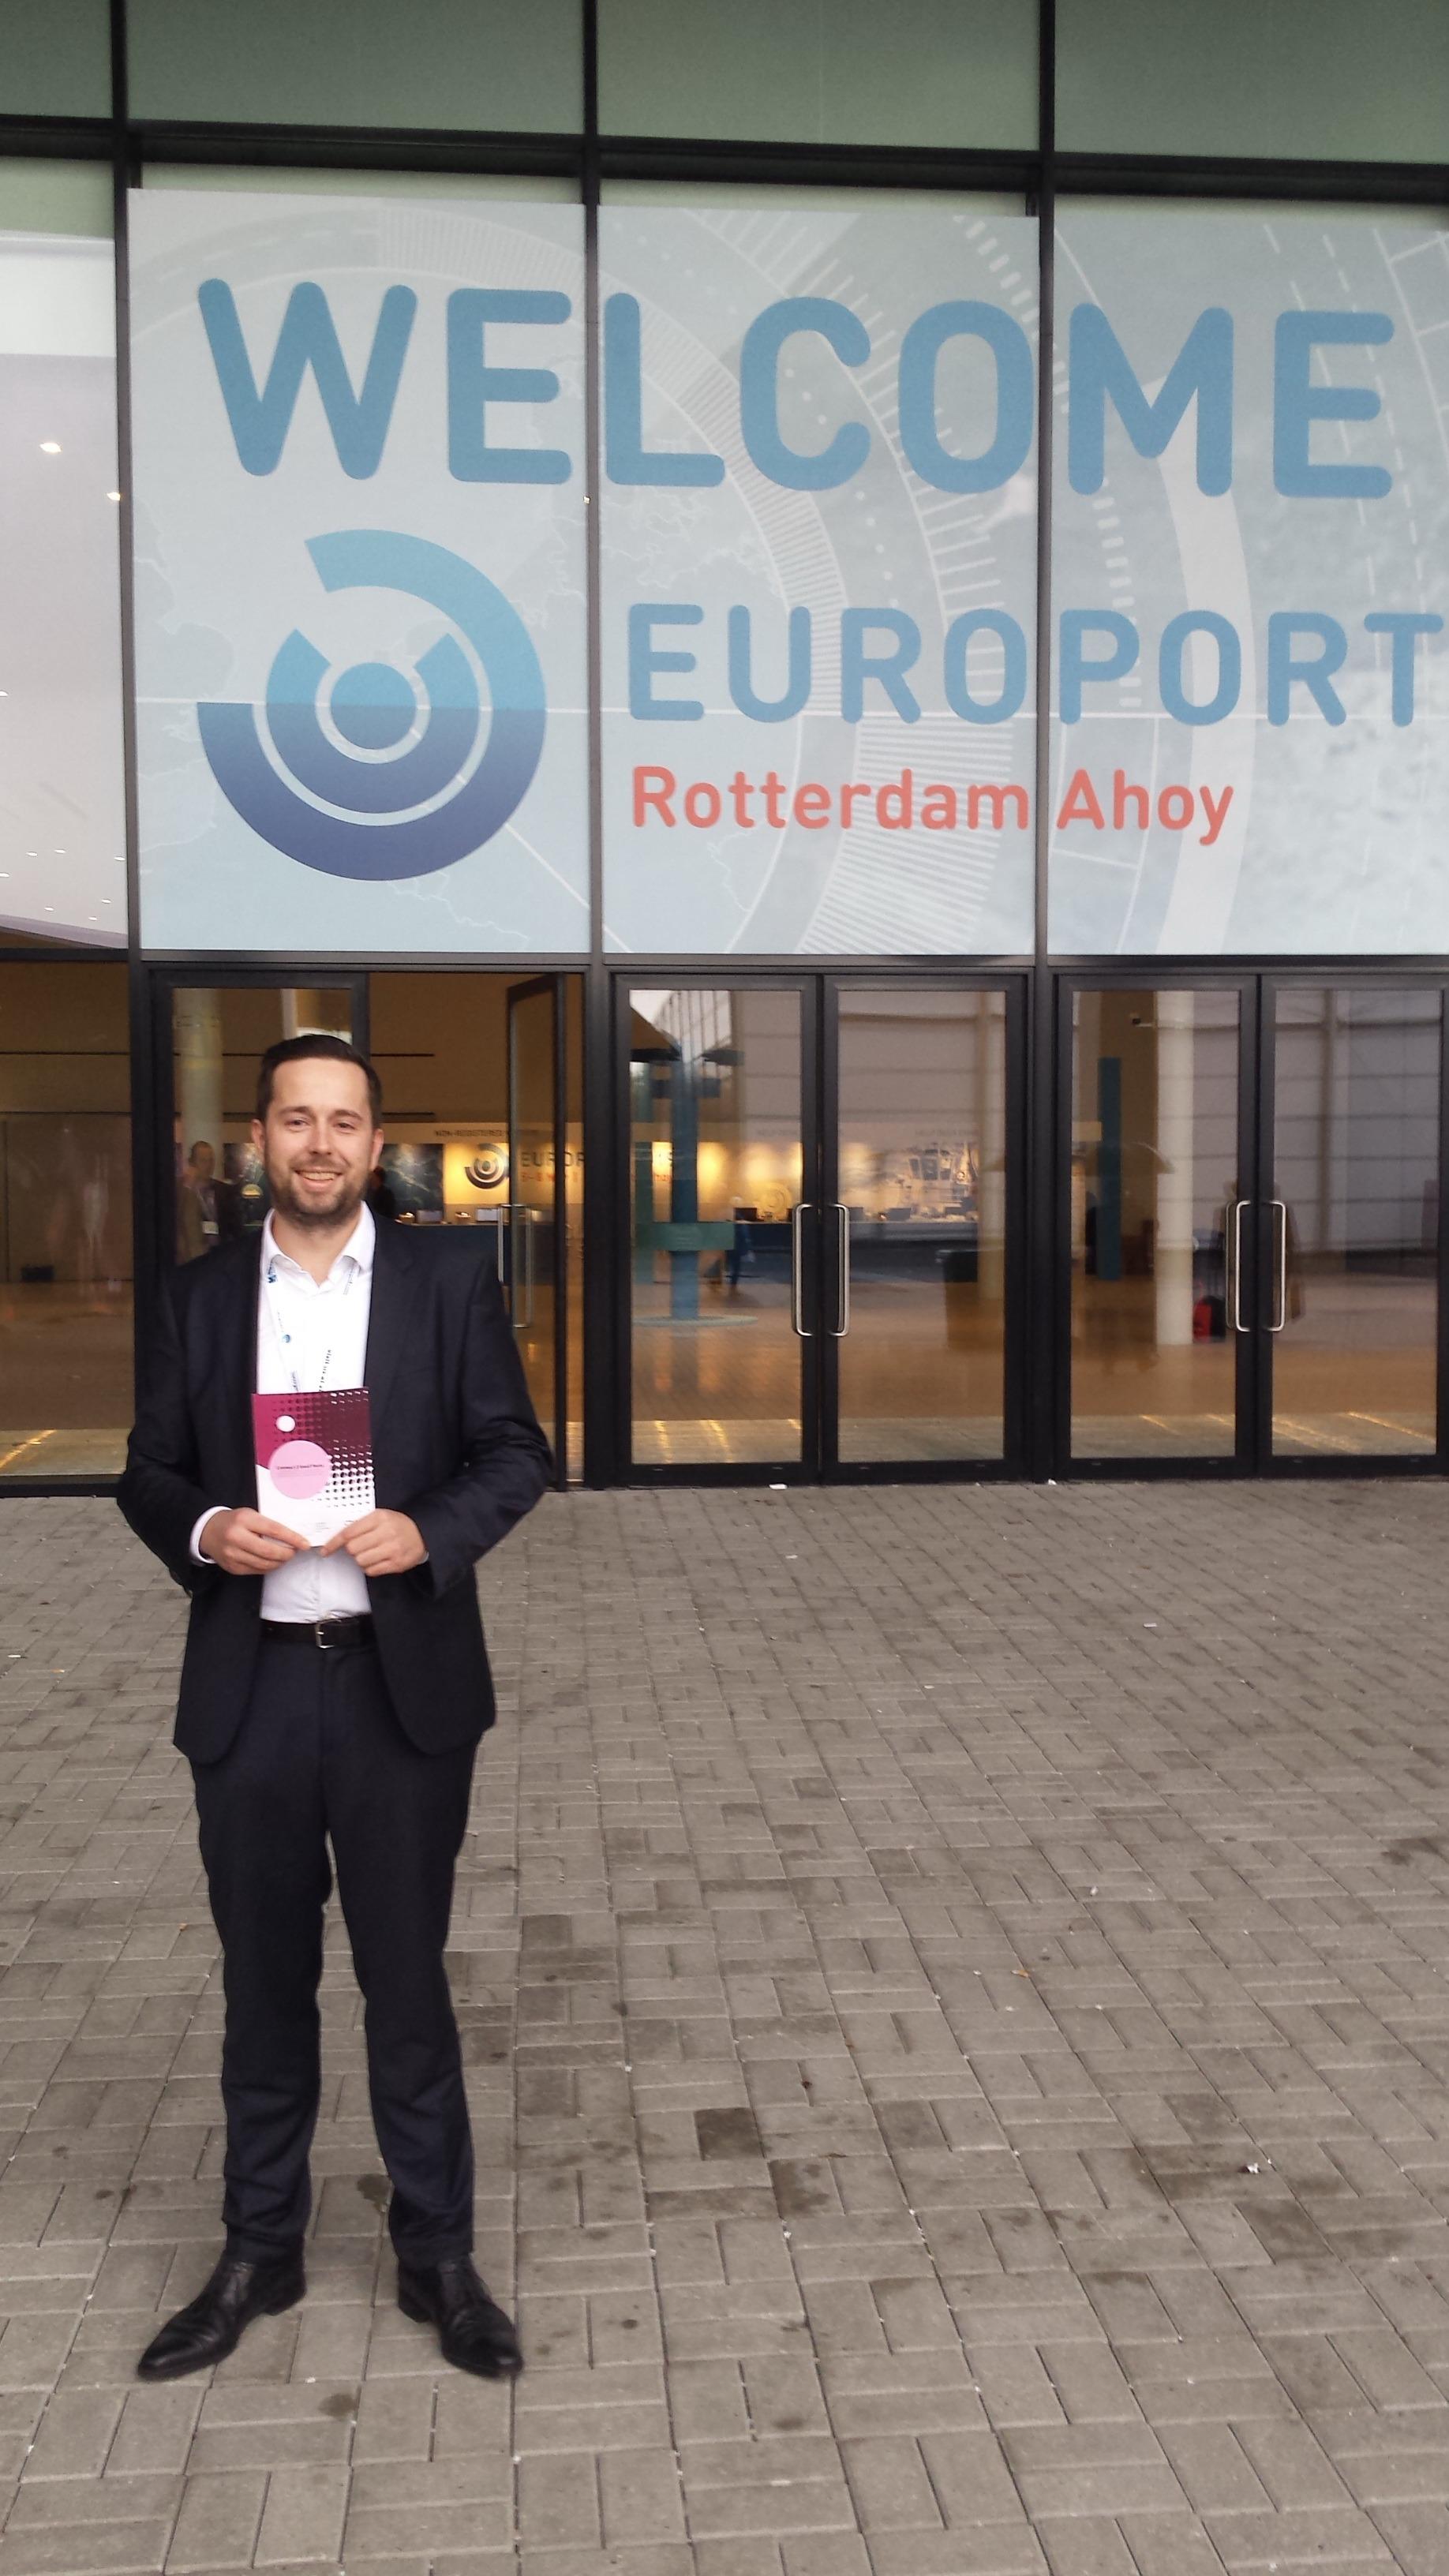 WP 6.4 – International Match Making Event, Europort 2019 in Rotterdam